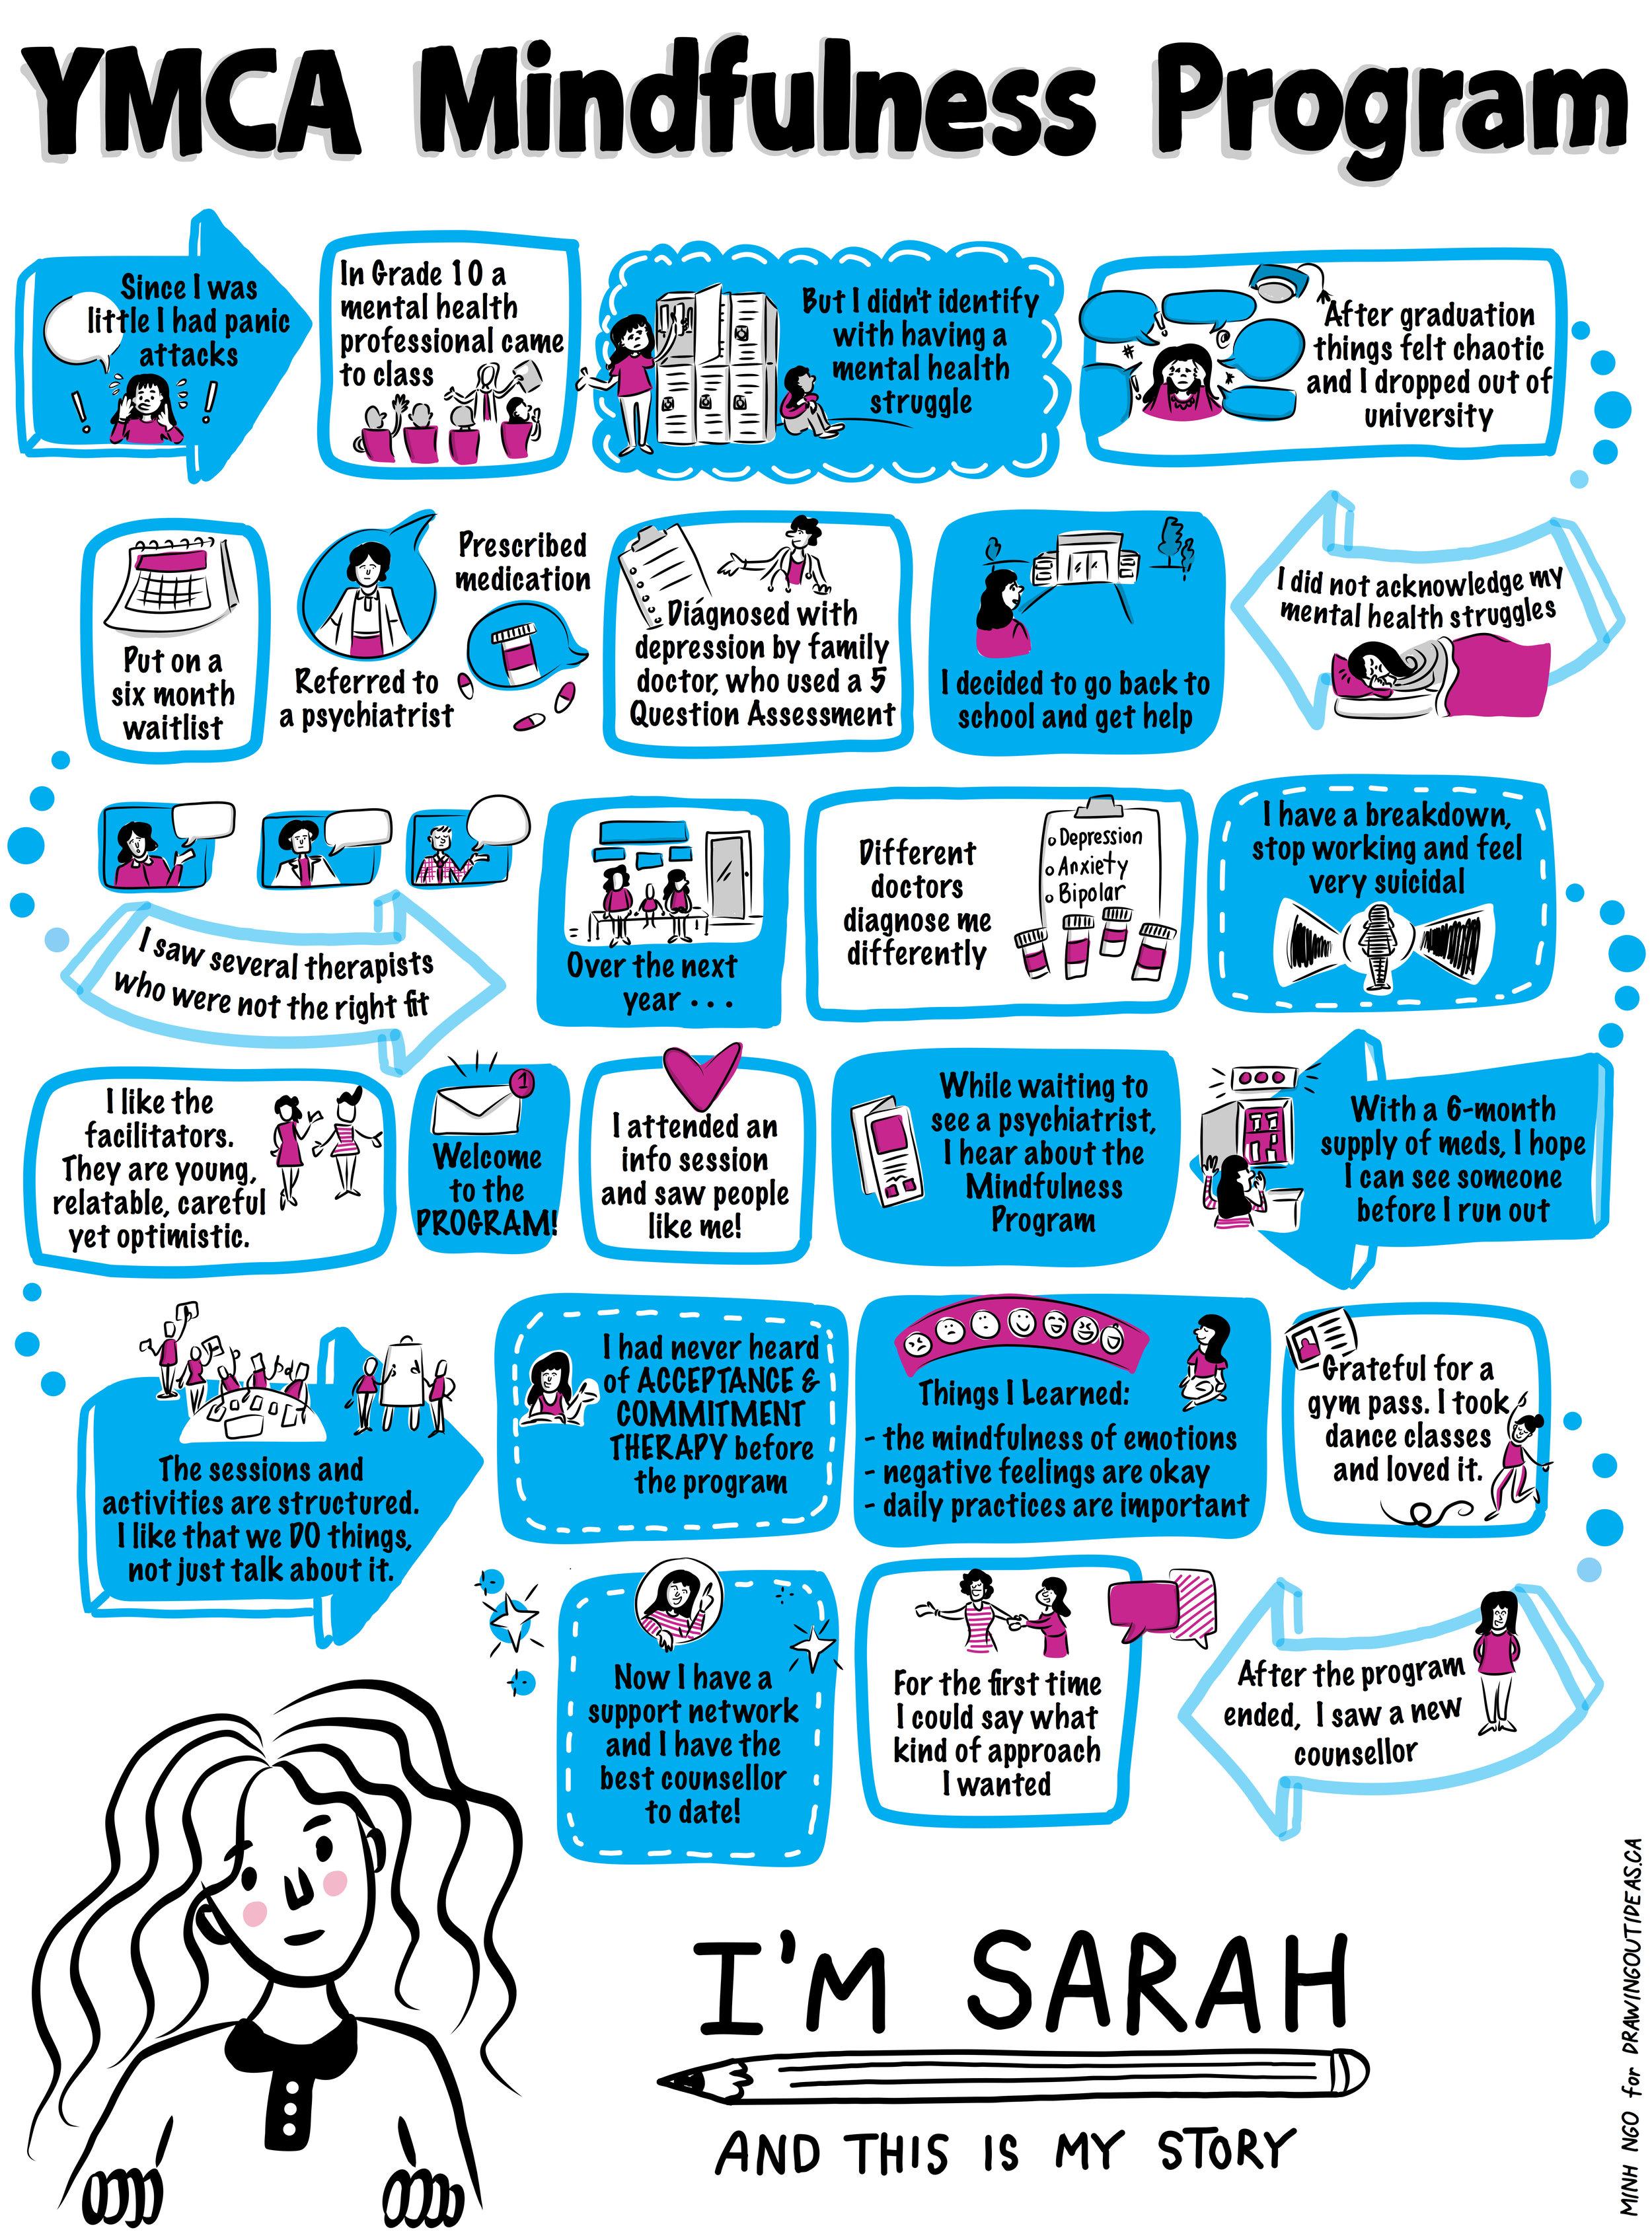 YMCA Mindfulness Sarah Story_December 20.jpg